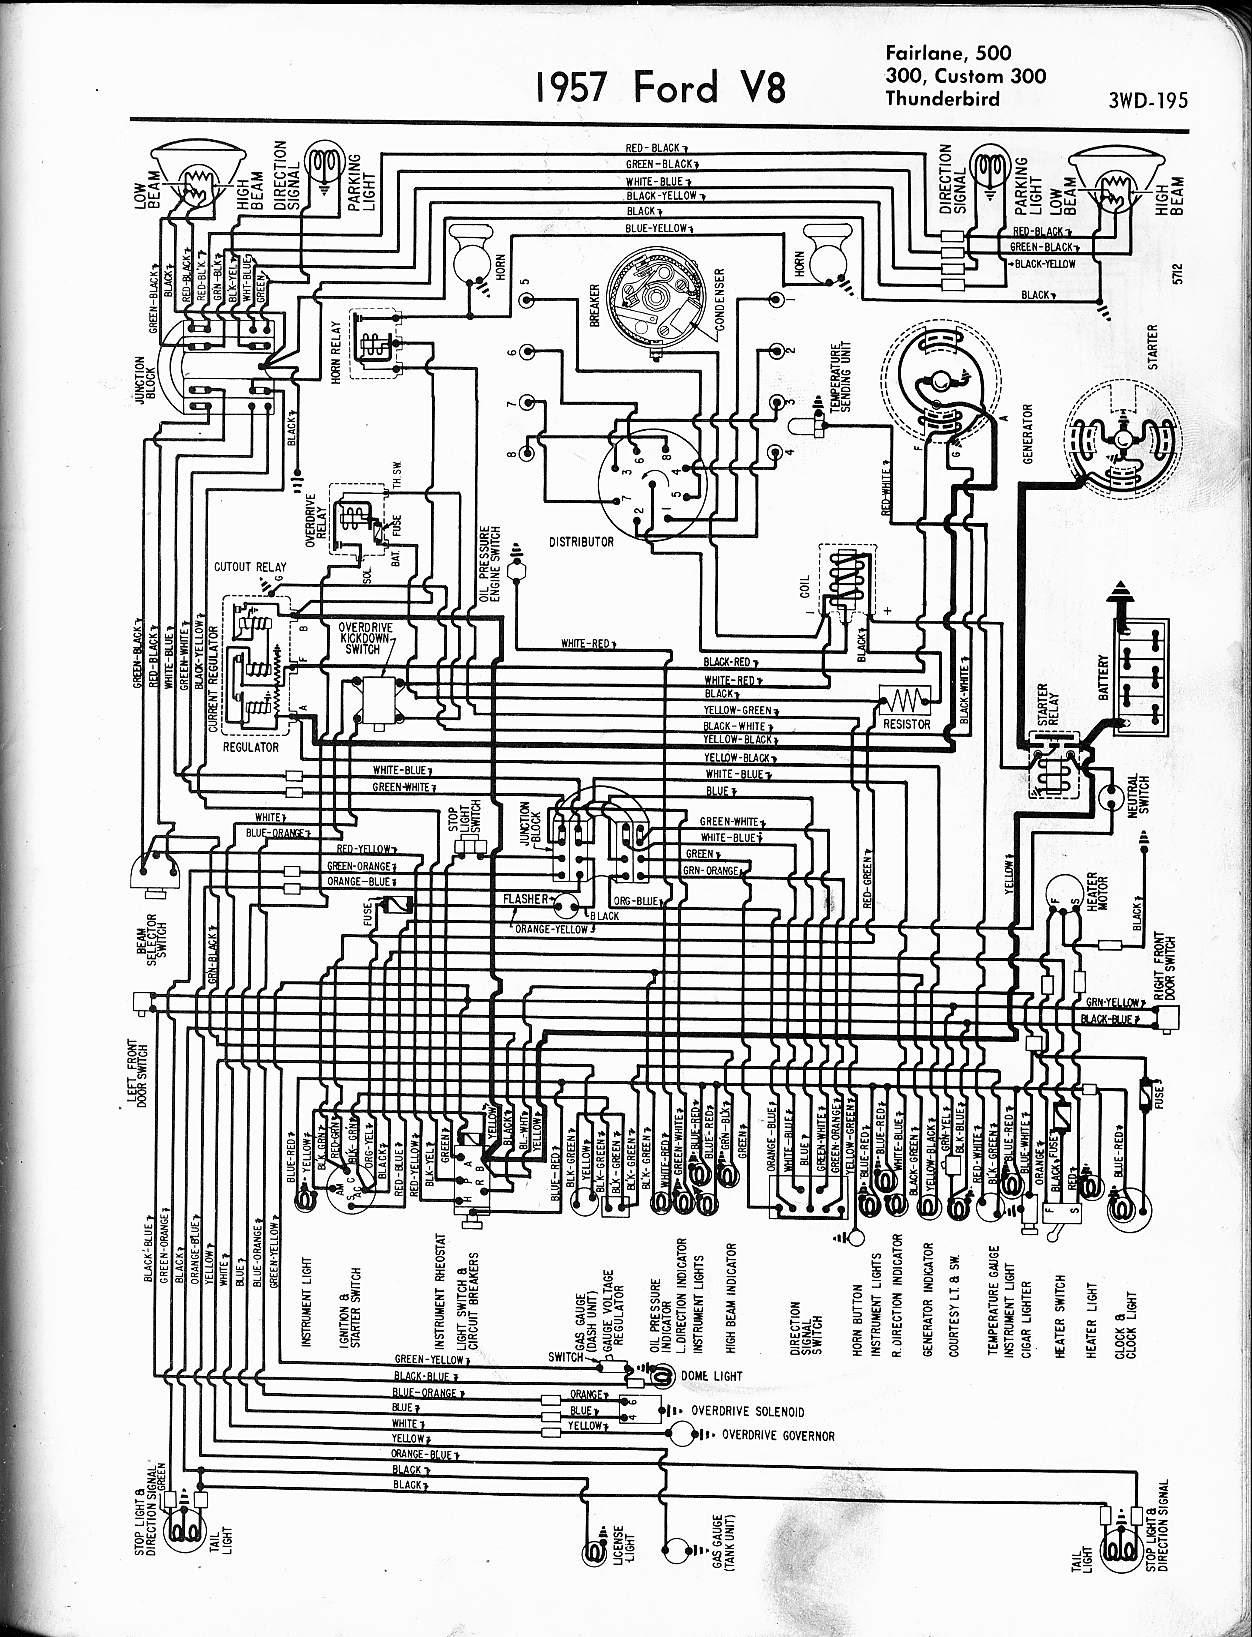 56 Chevy 3100 Wiring Diagram Wiring Diagram Jeep Grand Cherokee 2001 Power Poles Nescafe Jeanjaures37 Fr